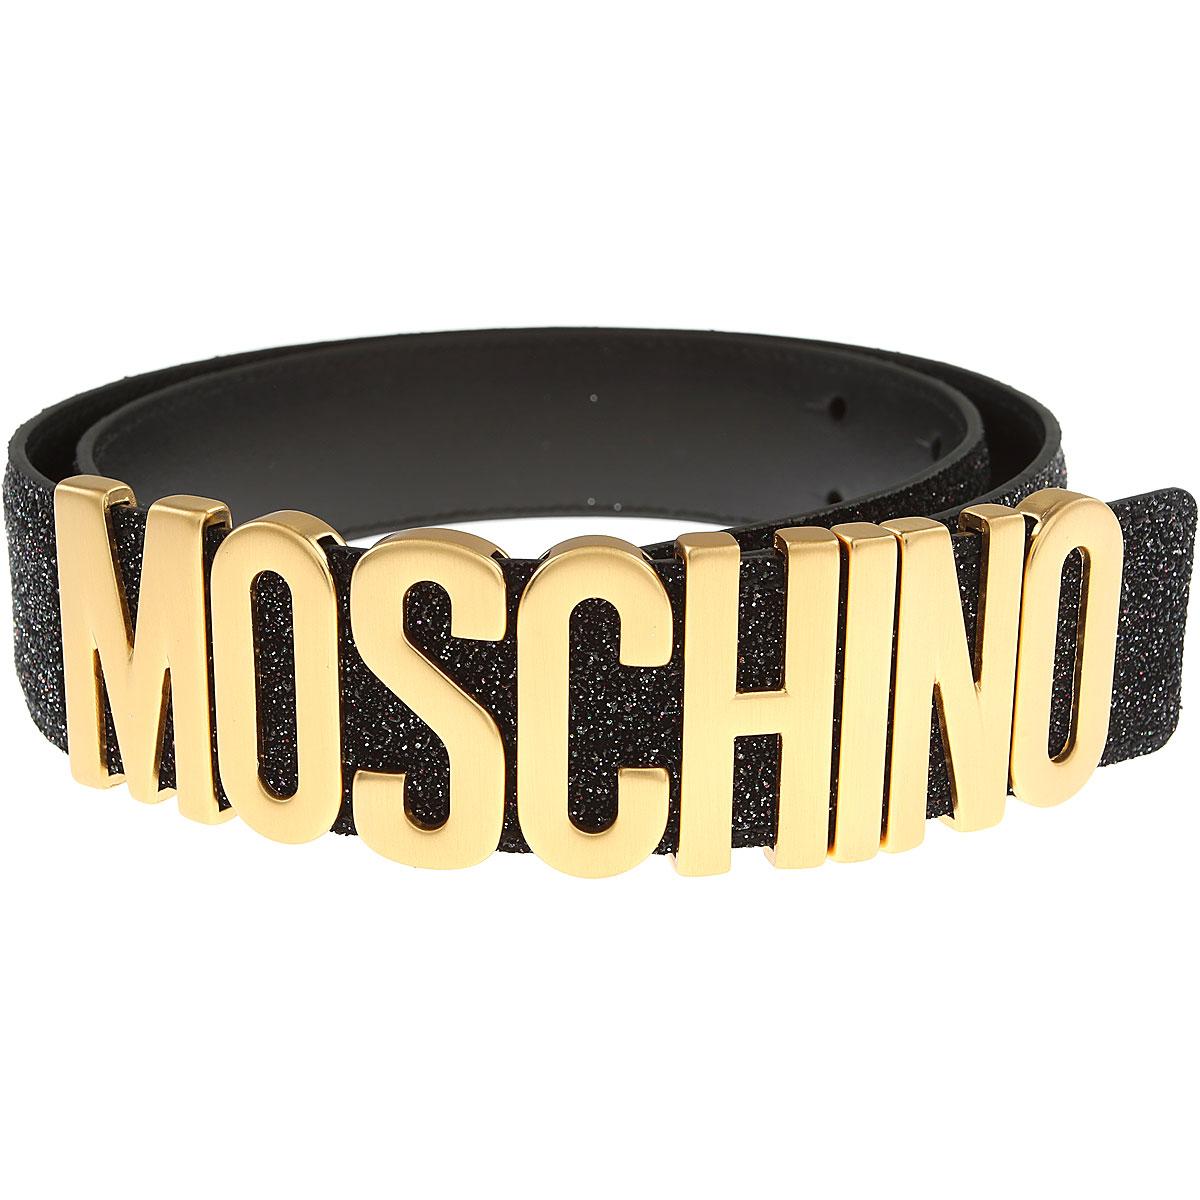 Moschino Womens Belts, Black, Glittered Leather, 2017, Eu - 38 Eu - 40 EU - 42 Eu - 44 Eu - 46